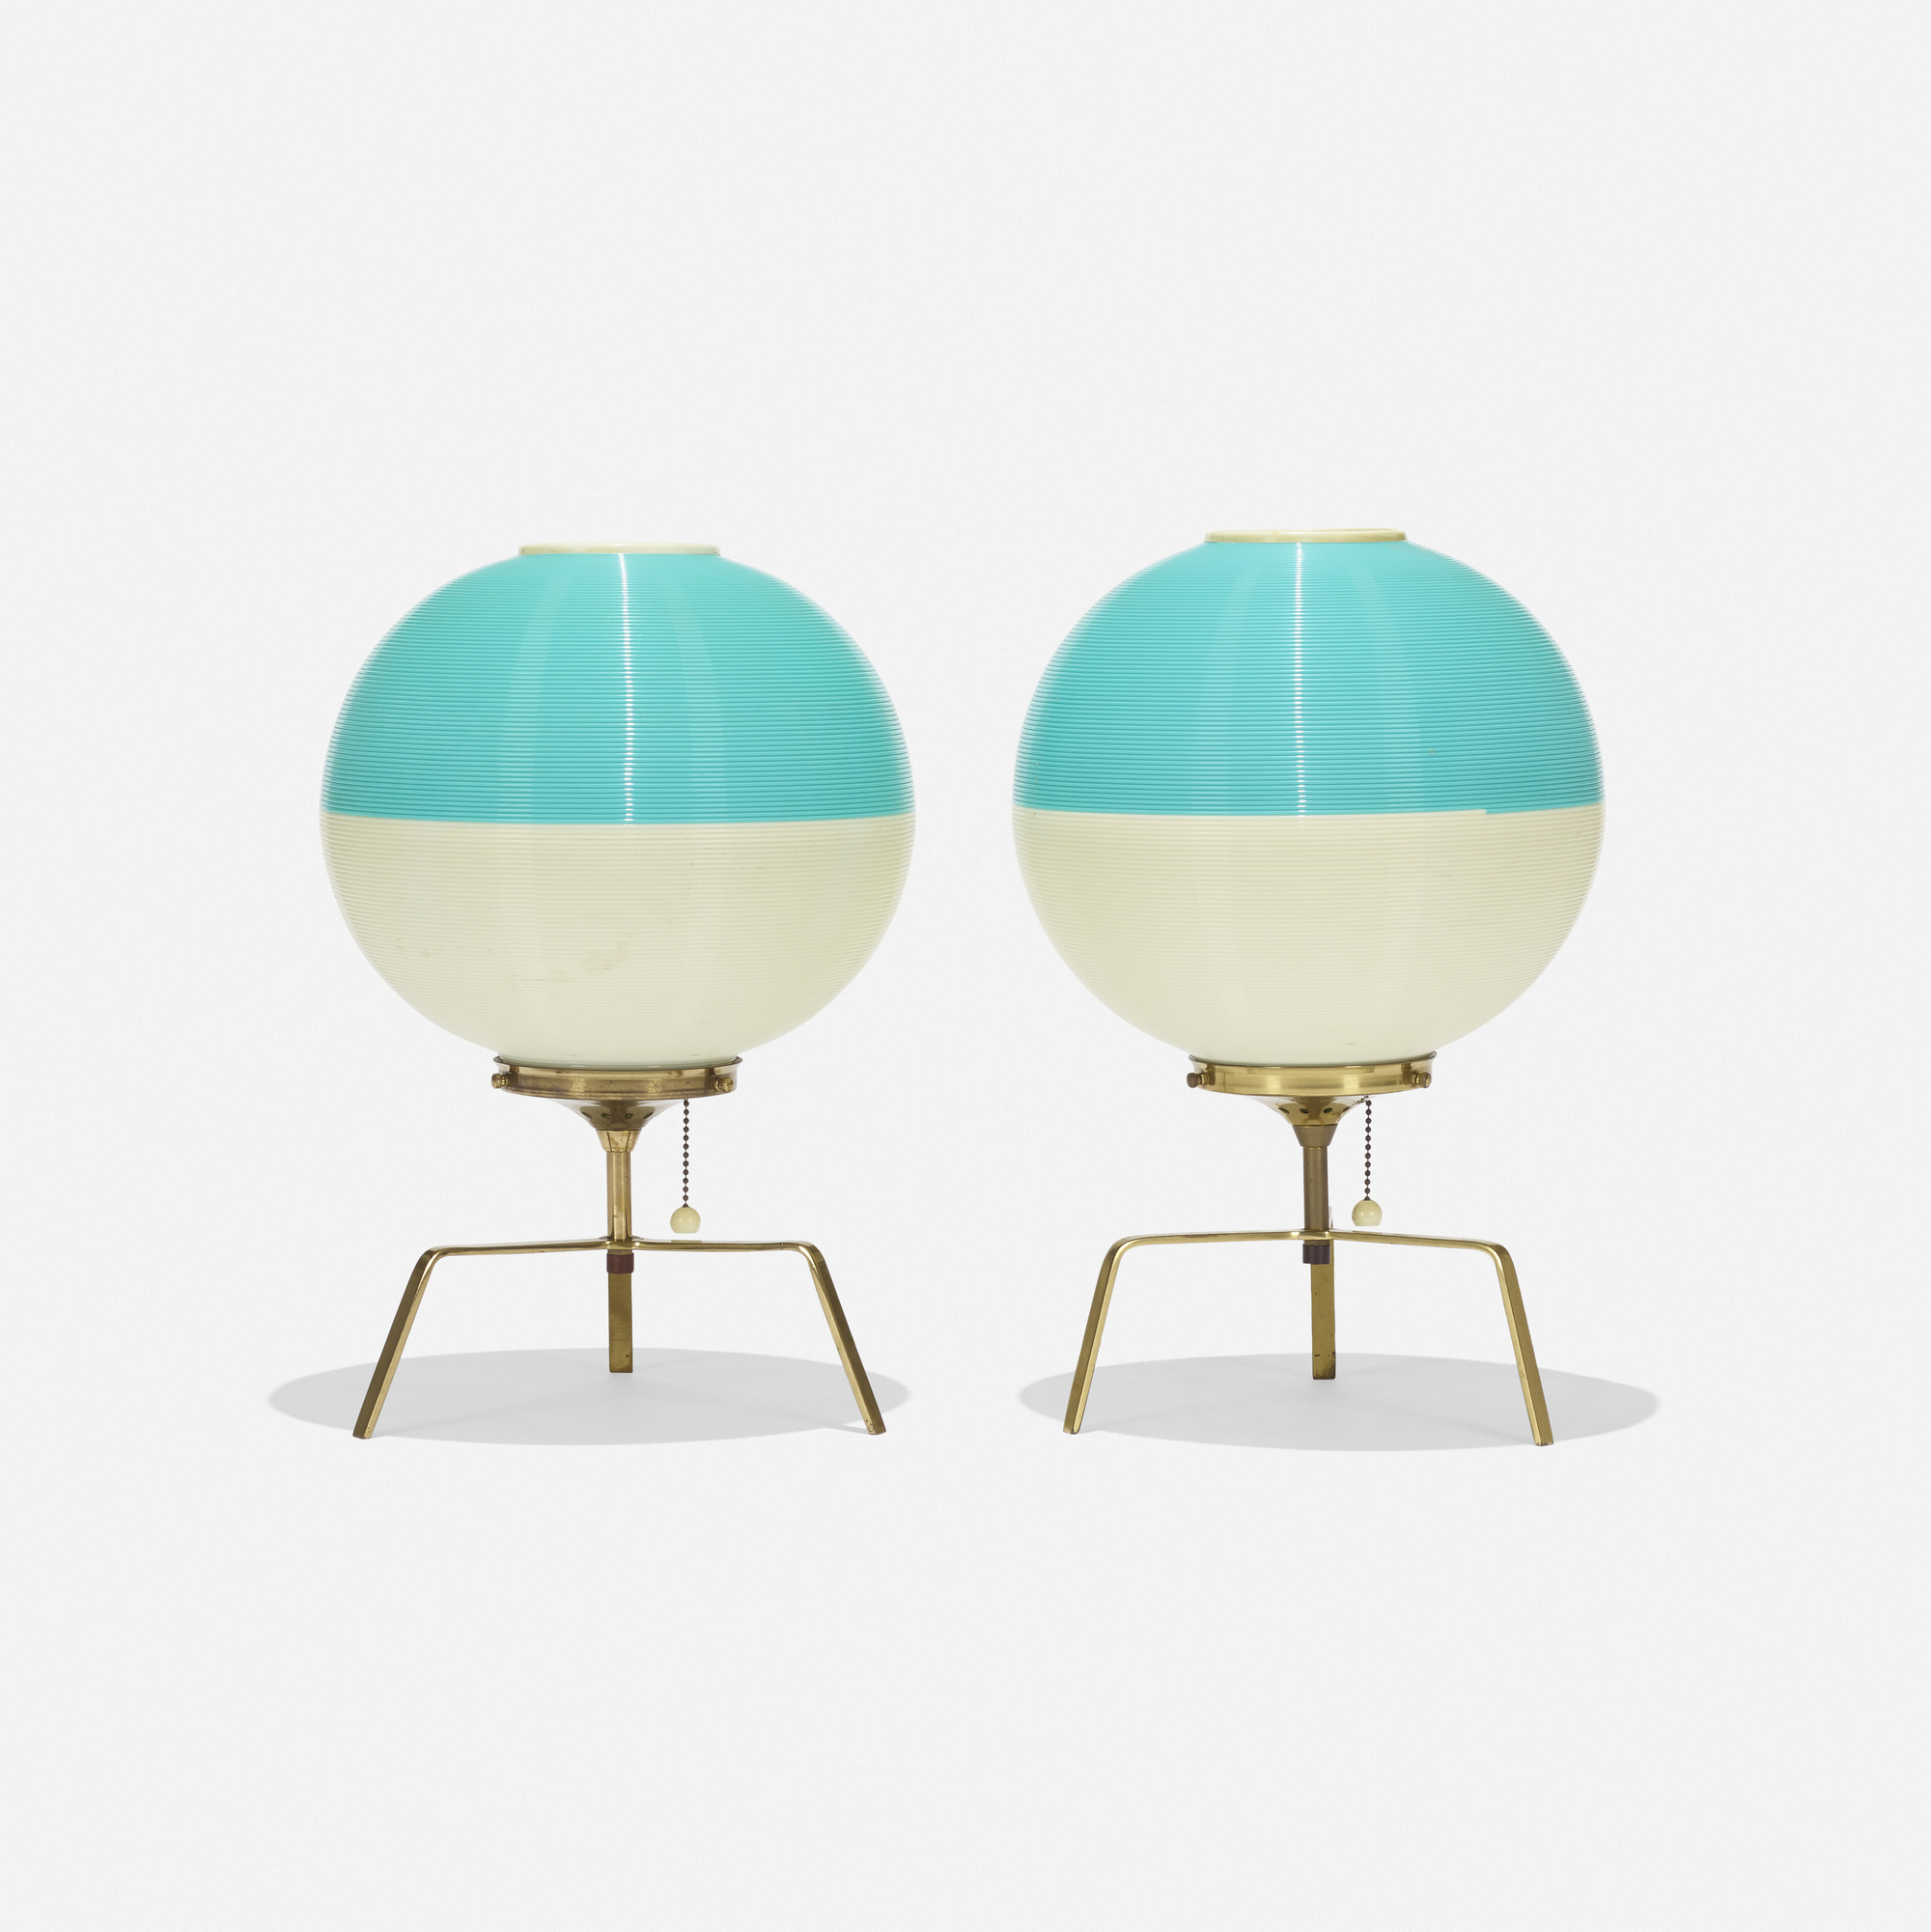 140: Yasha Heifetz / Rotaflex table lamps, pair (1 of 2)